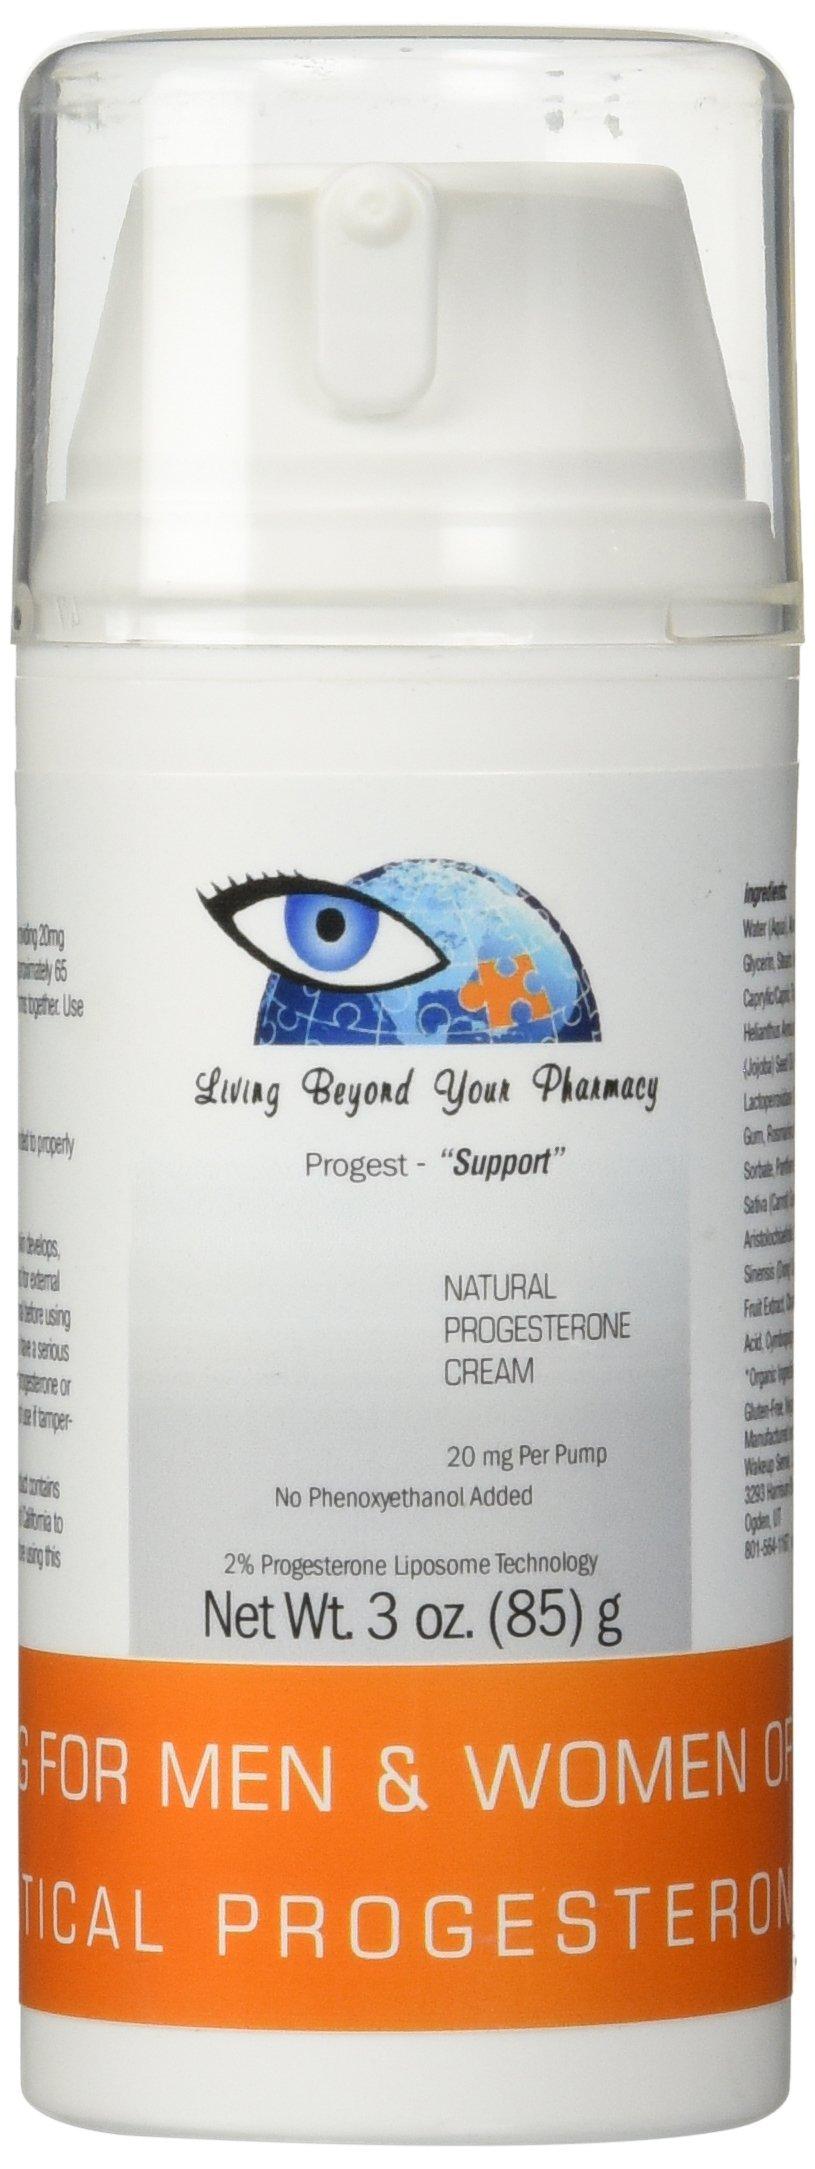 Progesterone Cream Bio-Identical USP - NO Phenoxyethanol - 3oz Bottle - All Natural Premium Fast Absorbing Fruit Extract Based Progesterone for Women & Men